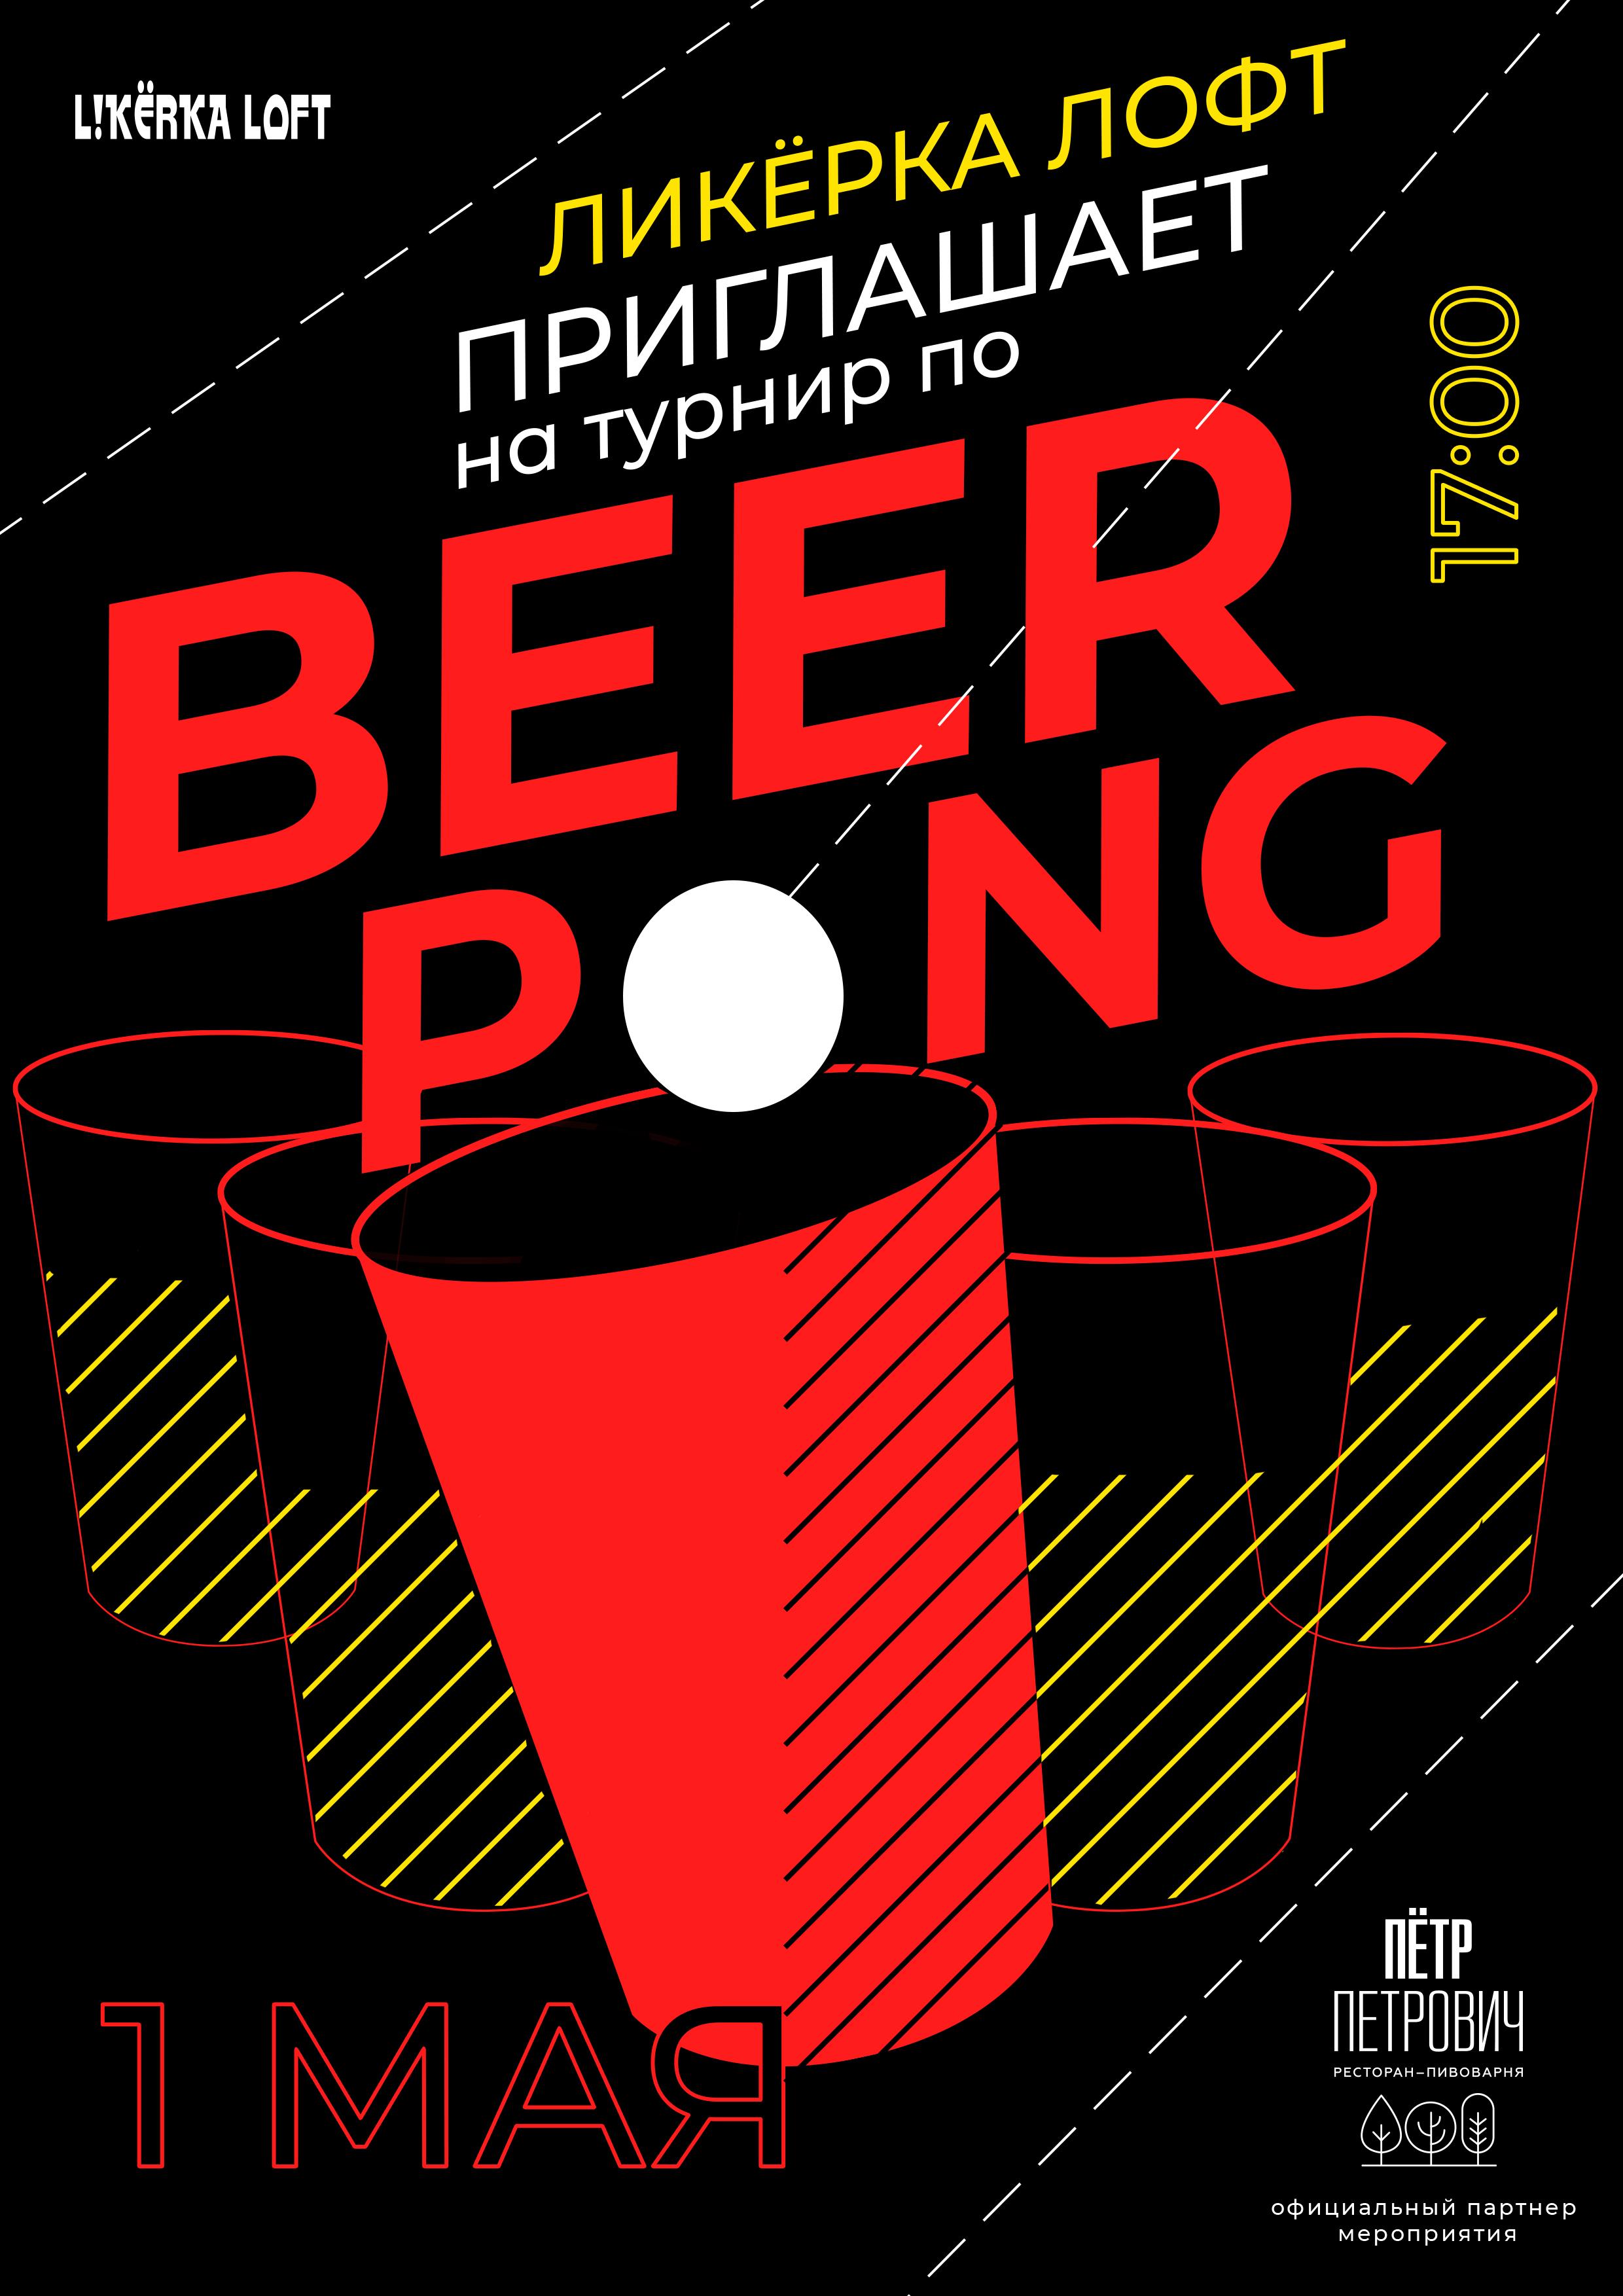 Турнир по BEER-PONG